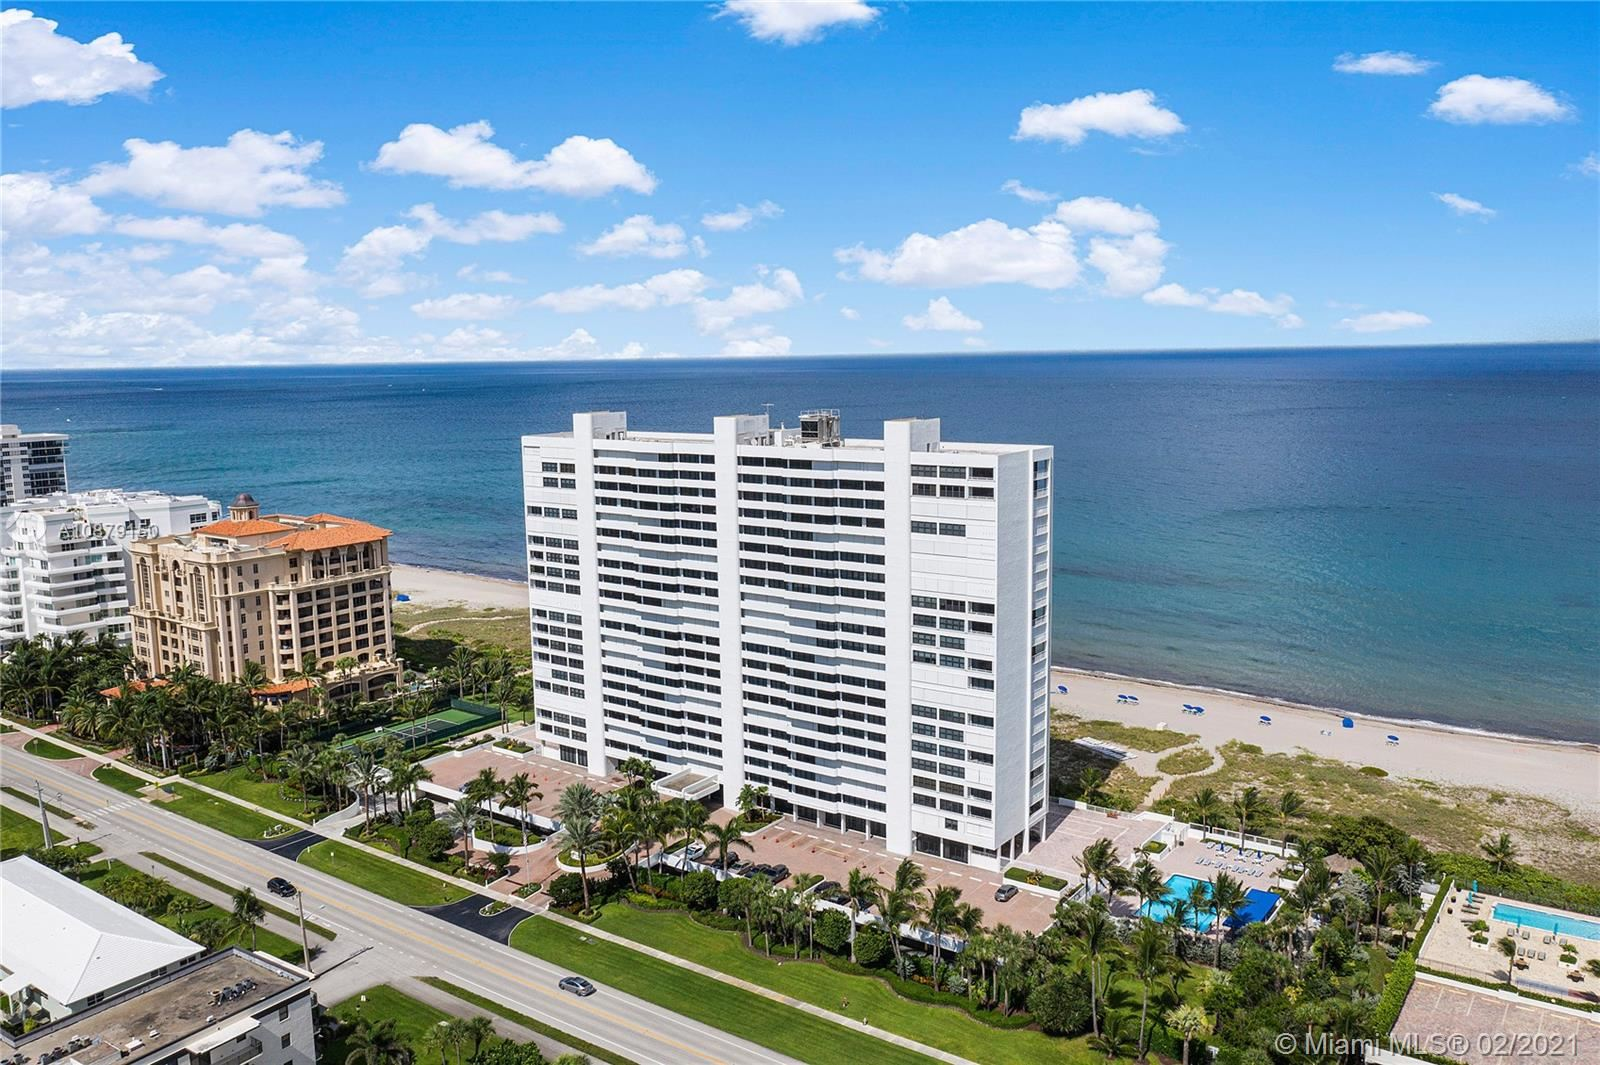 2600 S Ocean Blvd #4-C, Boca Raton, FL 33432 - #: A10879150